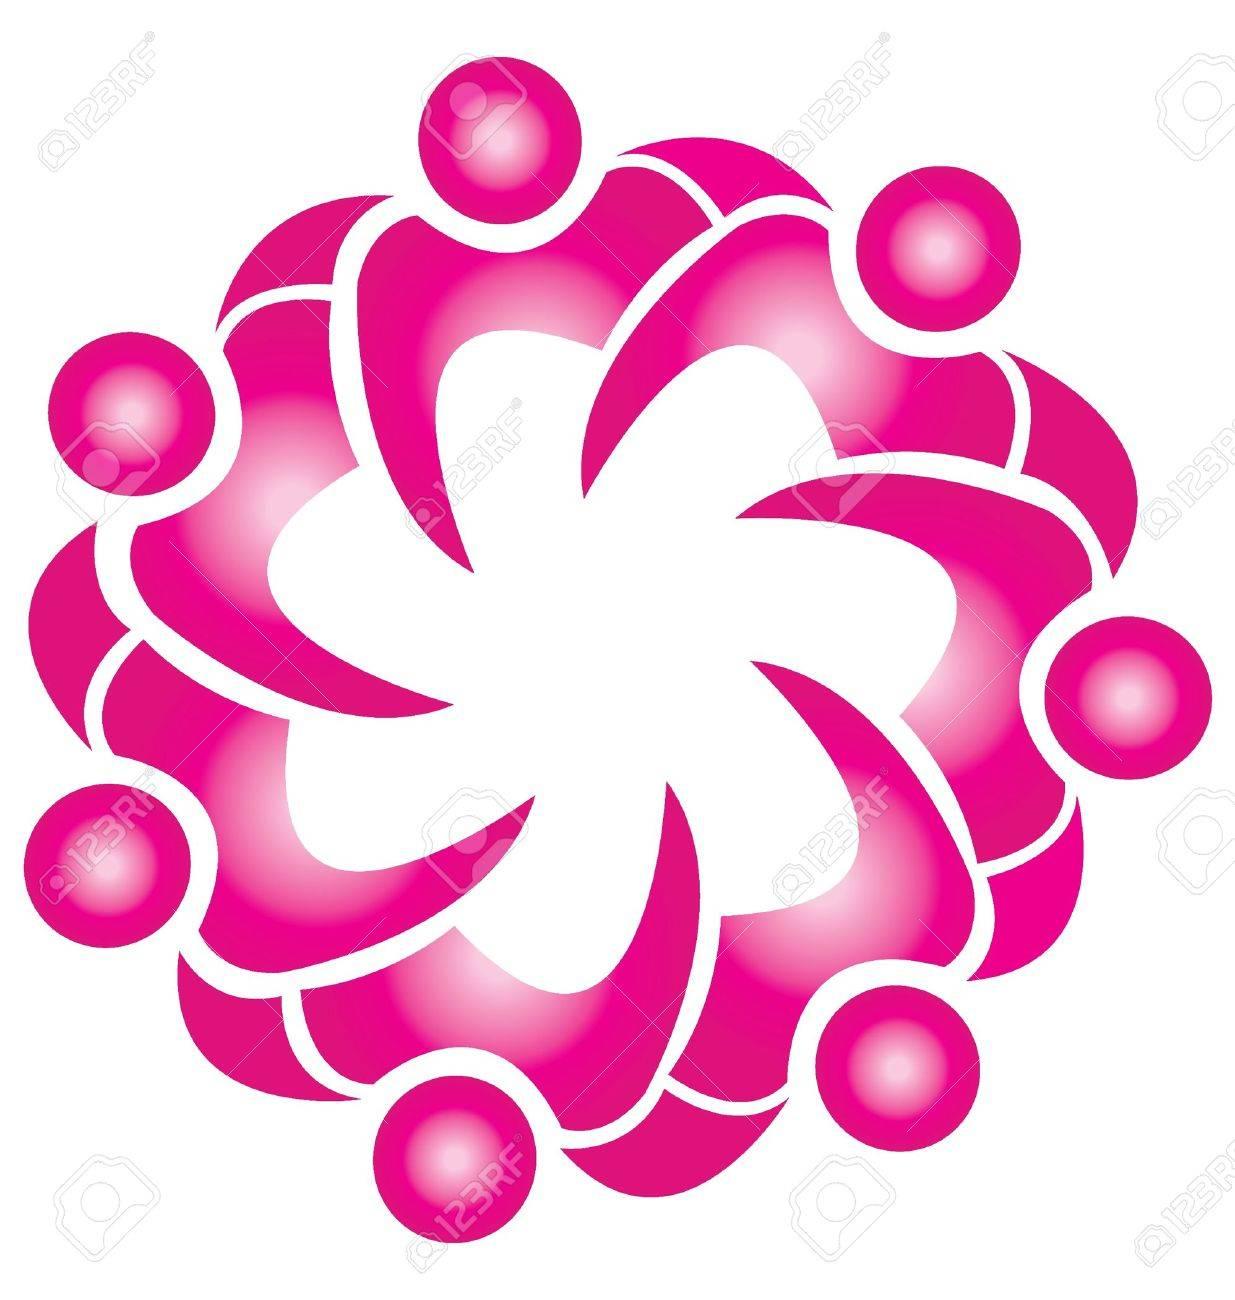 Teamwork fashion pink flower logo Stock Vector - 15252967